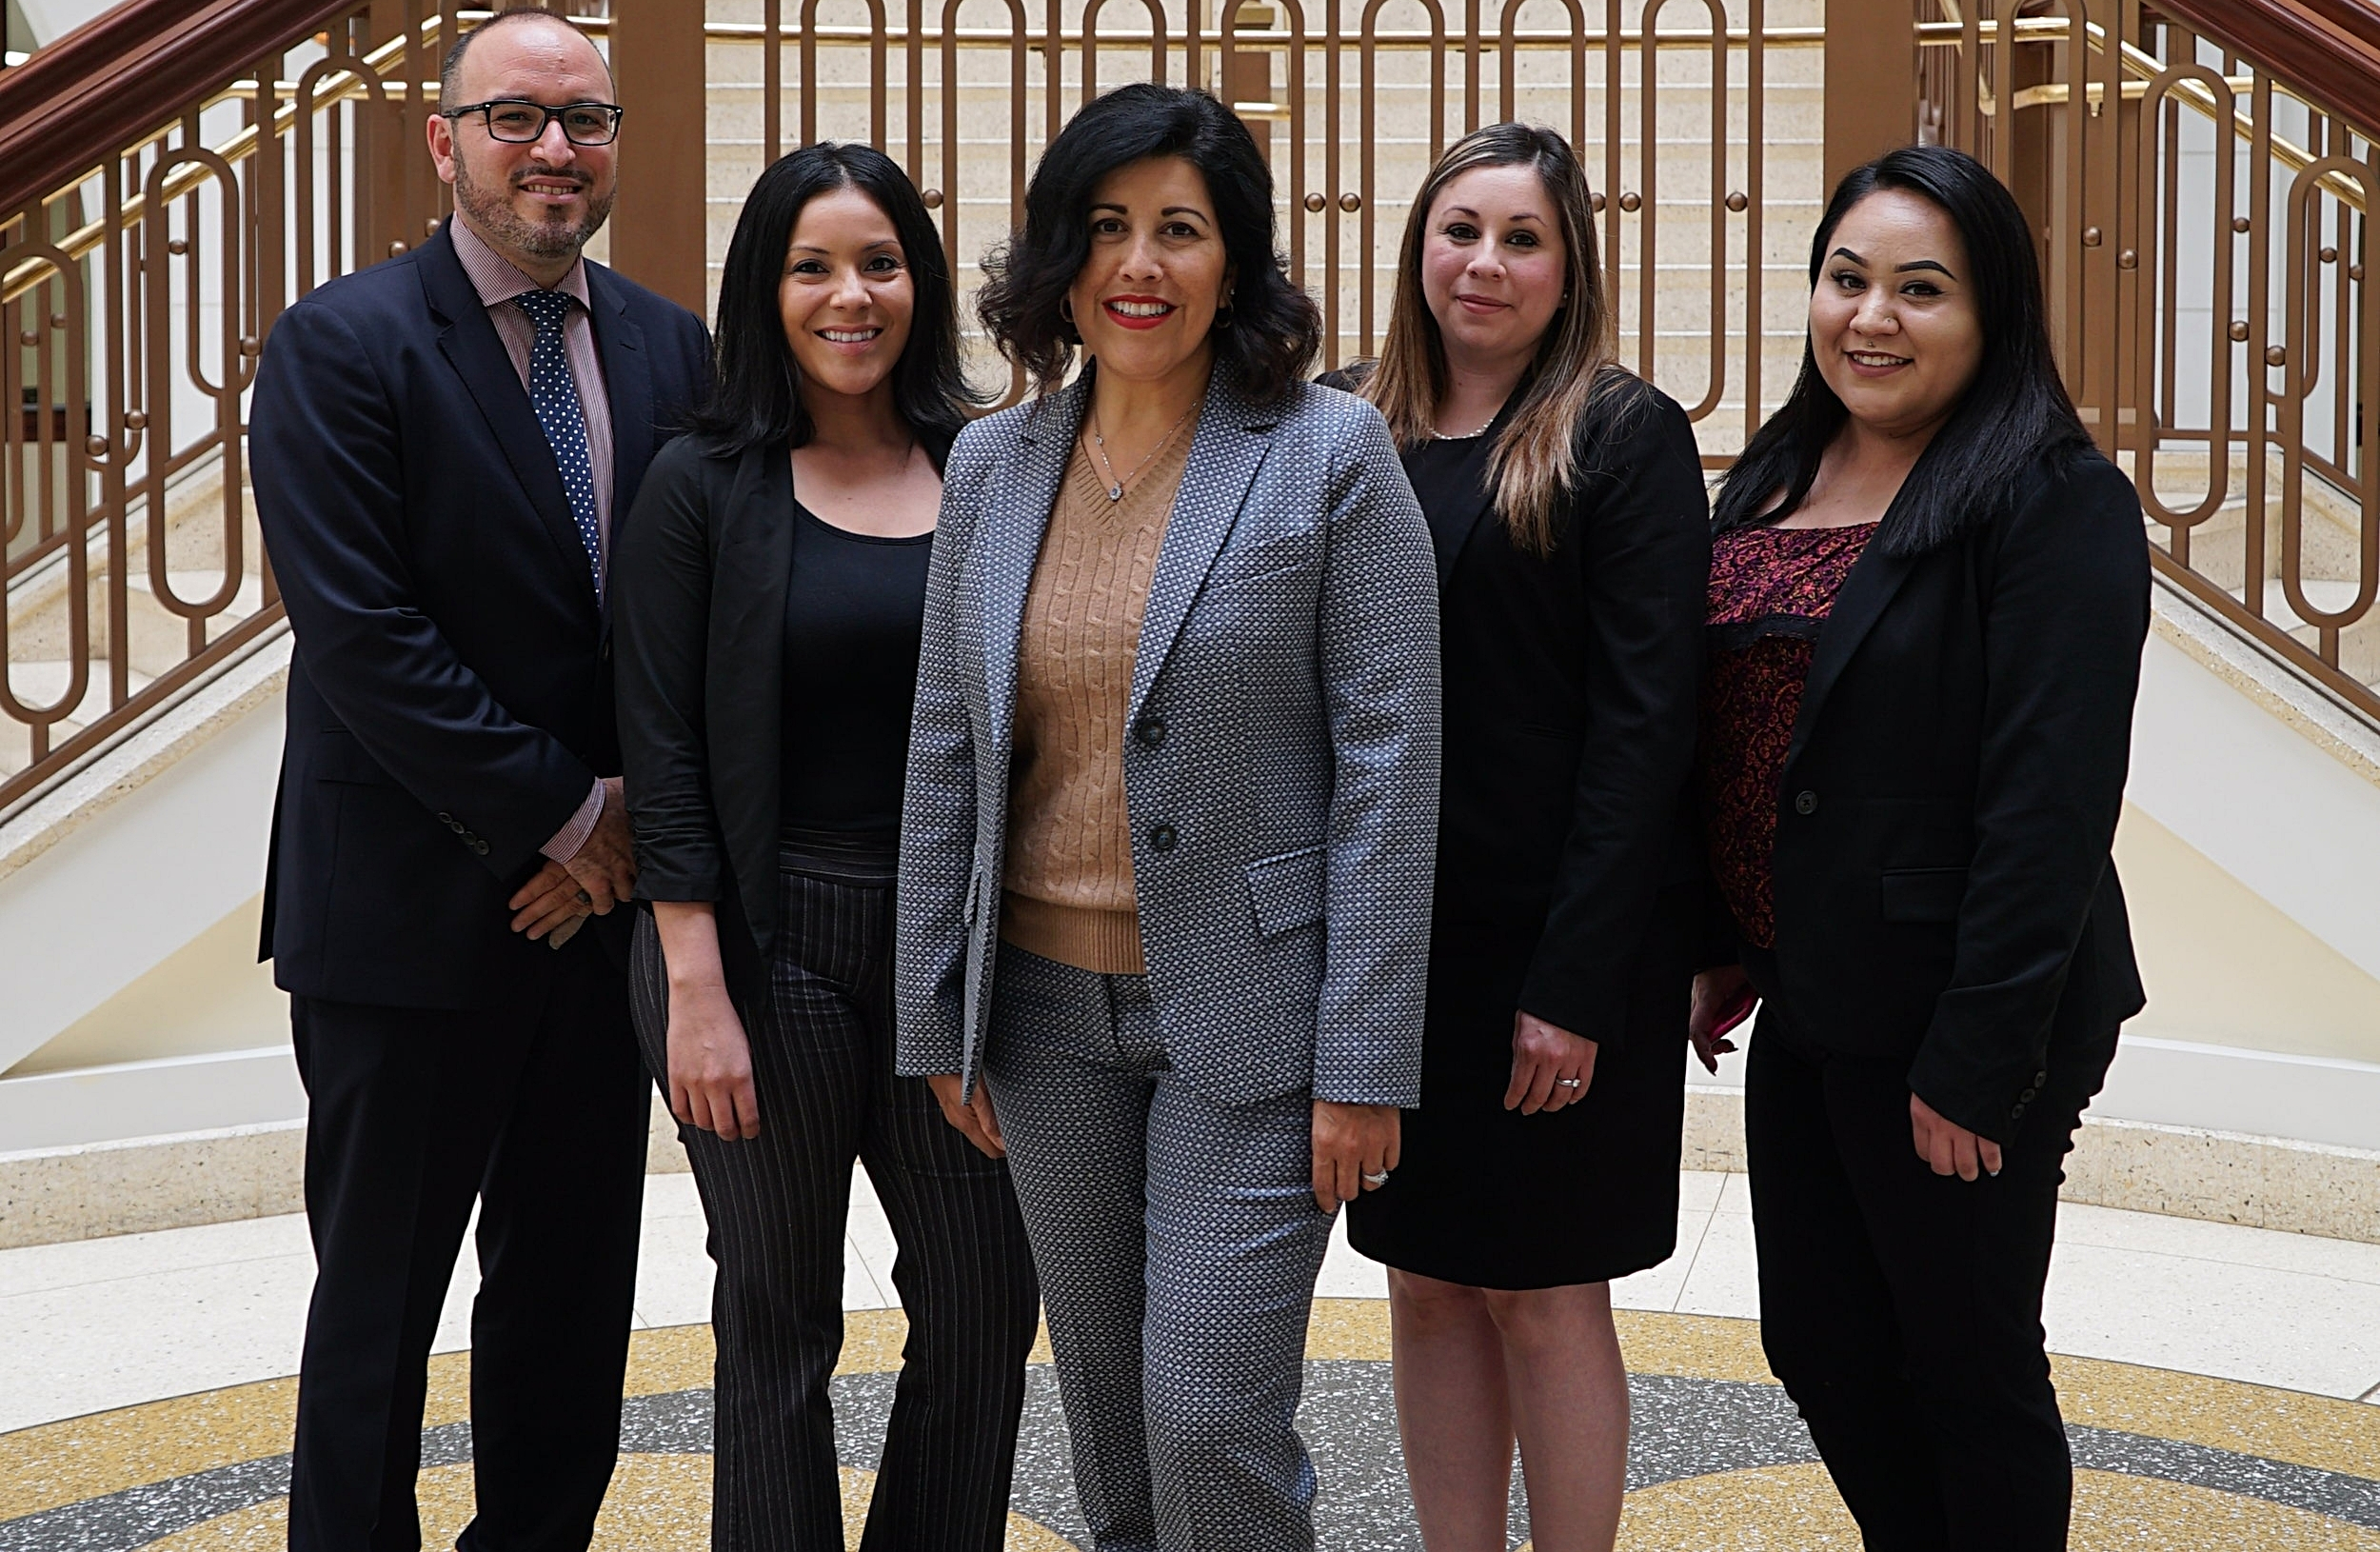 A winning legal team here to serve you. - Servicio en español